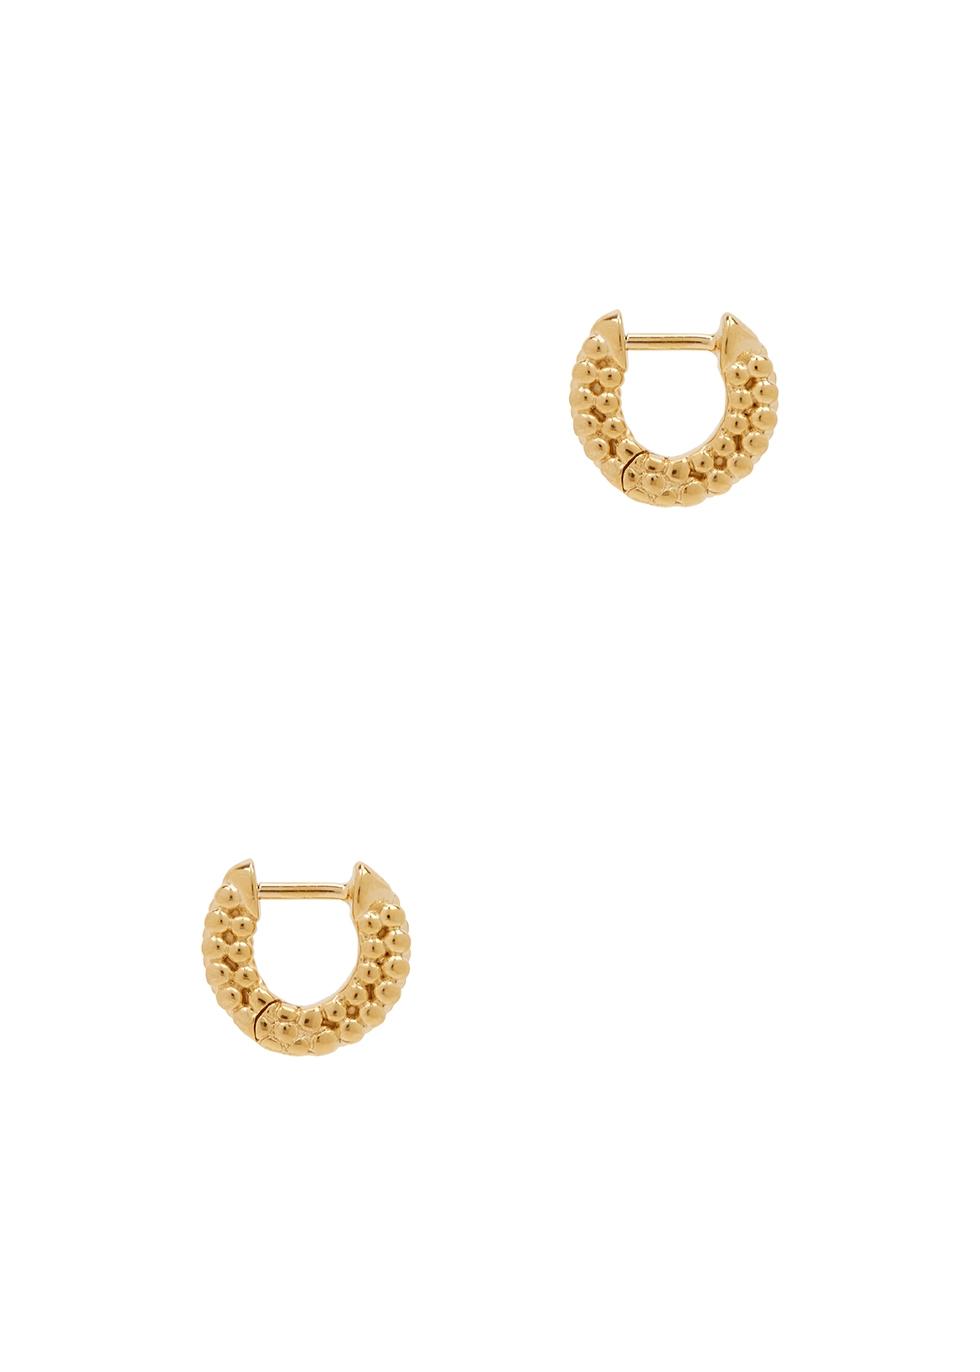 Dolly 18kt gold-plated hoop earrings